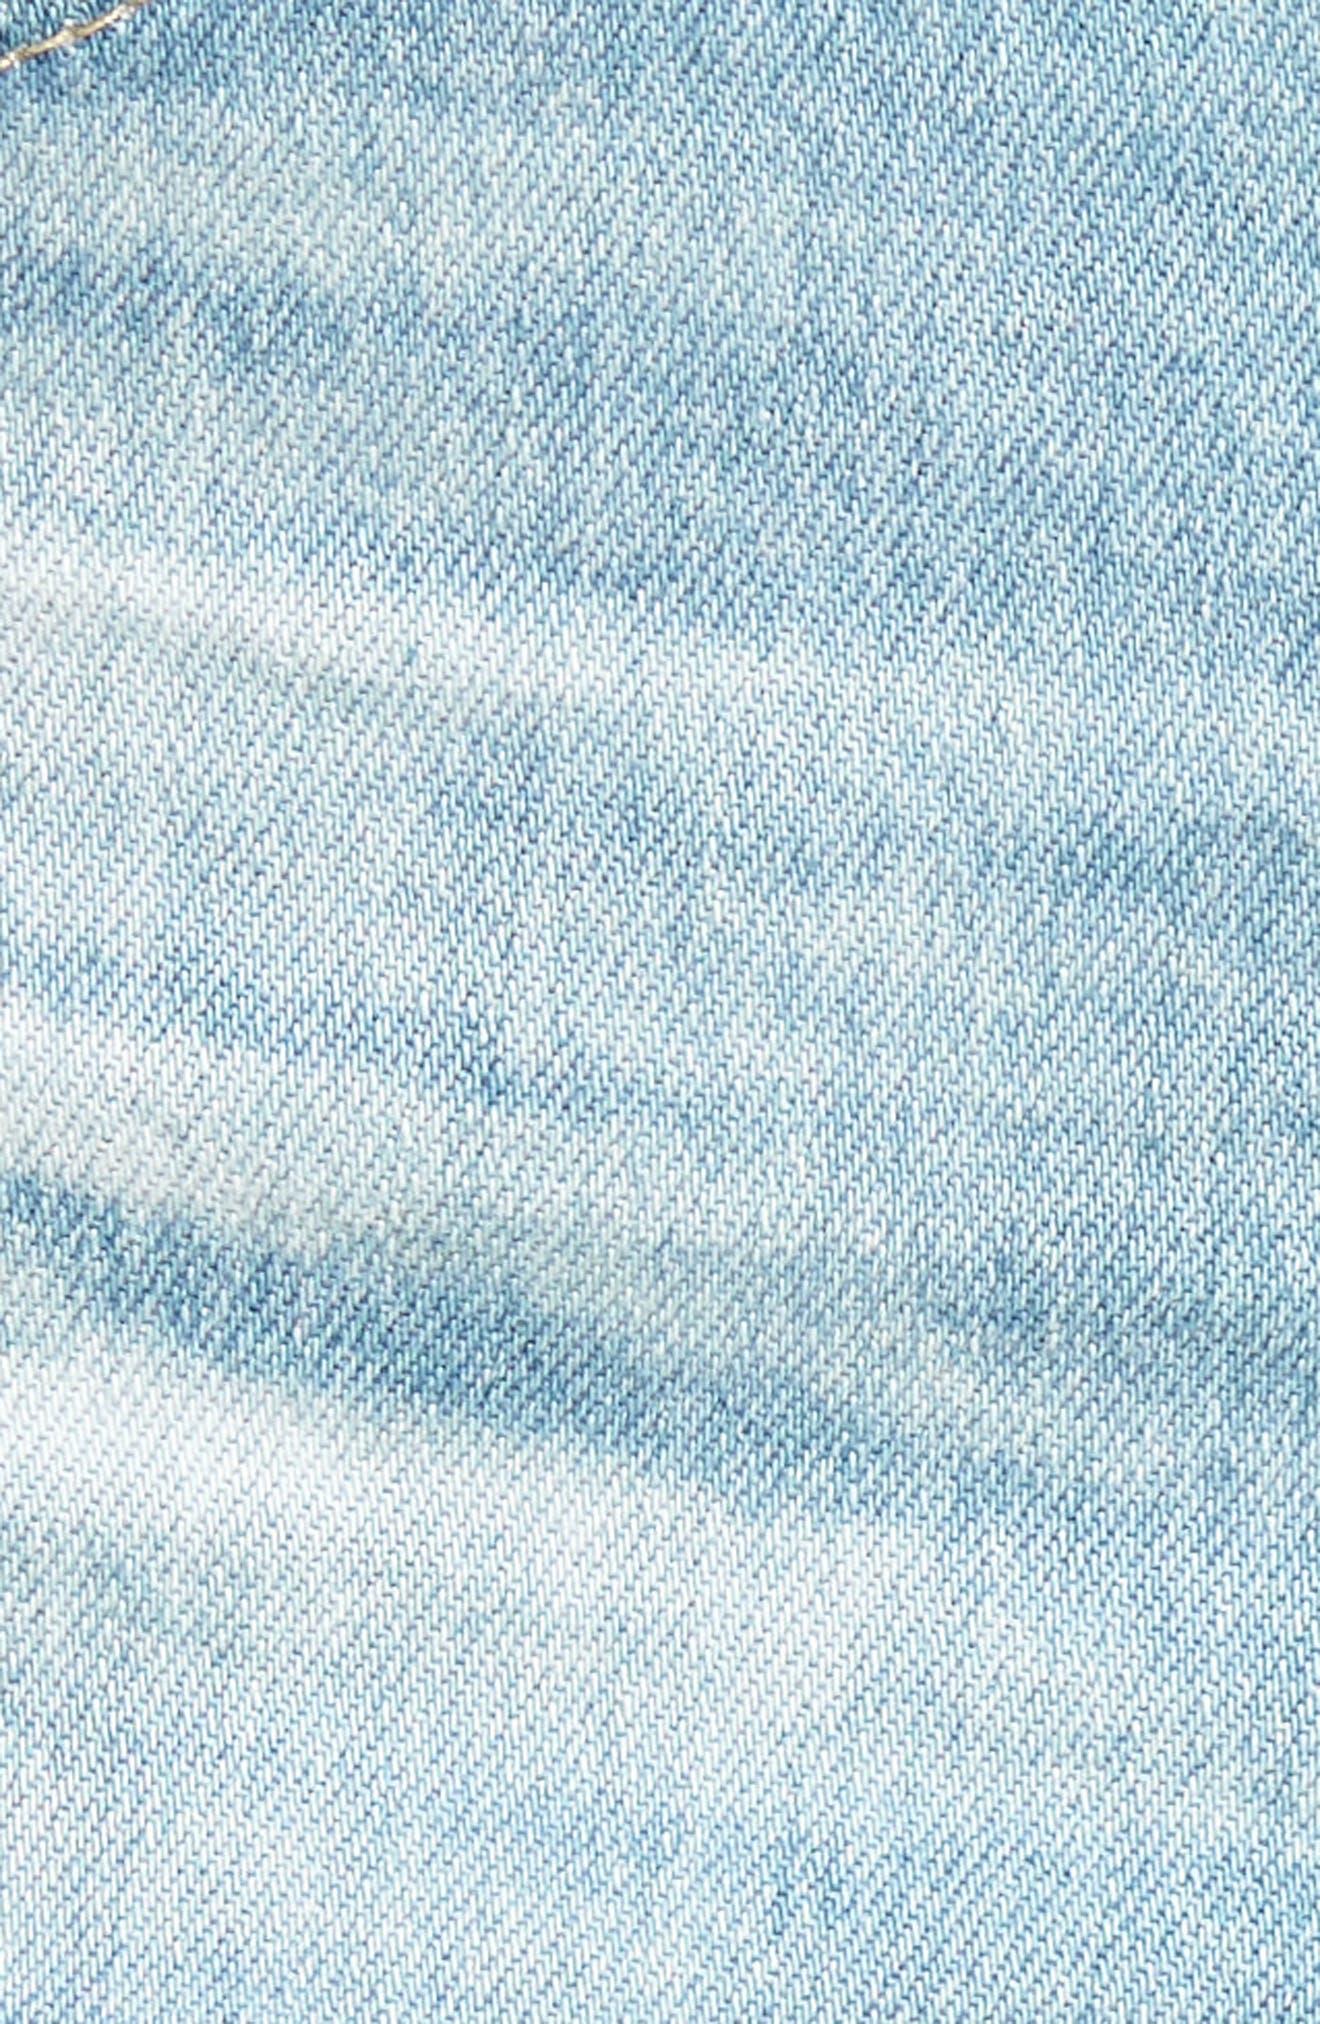 Bryn High Waist Cutoff Denim Shorts,                             Alternate thumbnail 6, color,                             23 Years Cerulean Chase